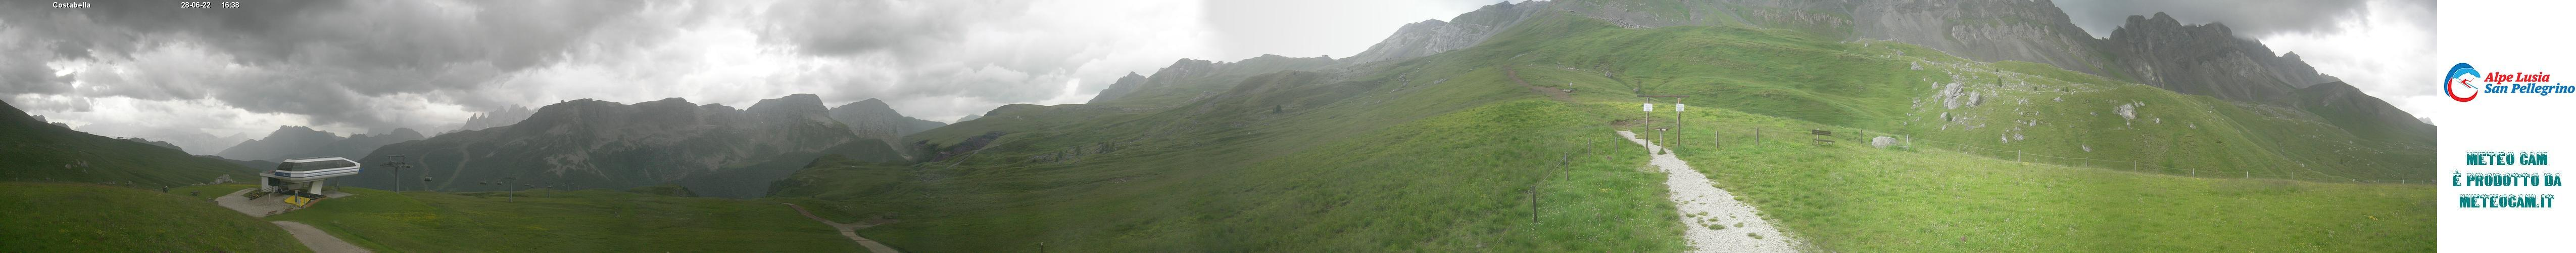 Webcam panoramica Costabella - Passo San Pellegrino-Falcade